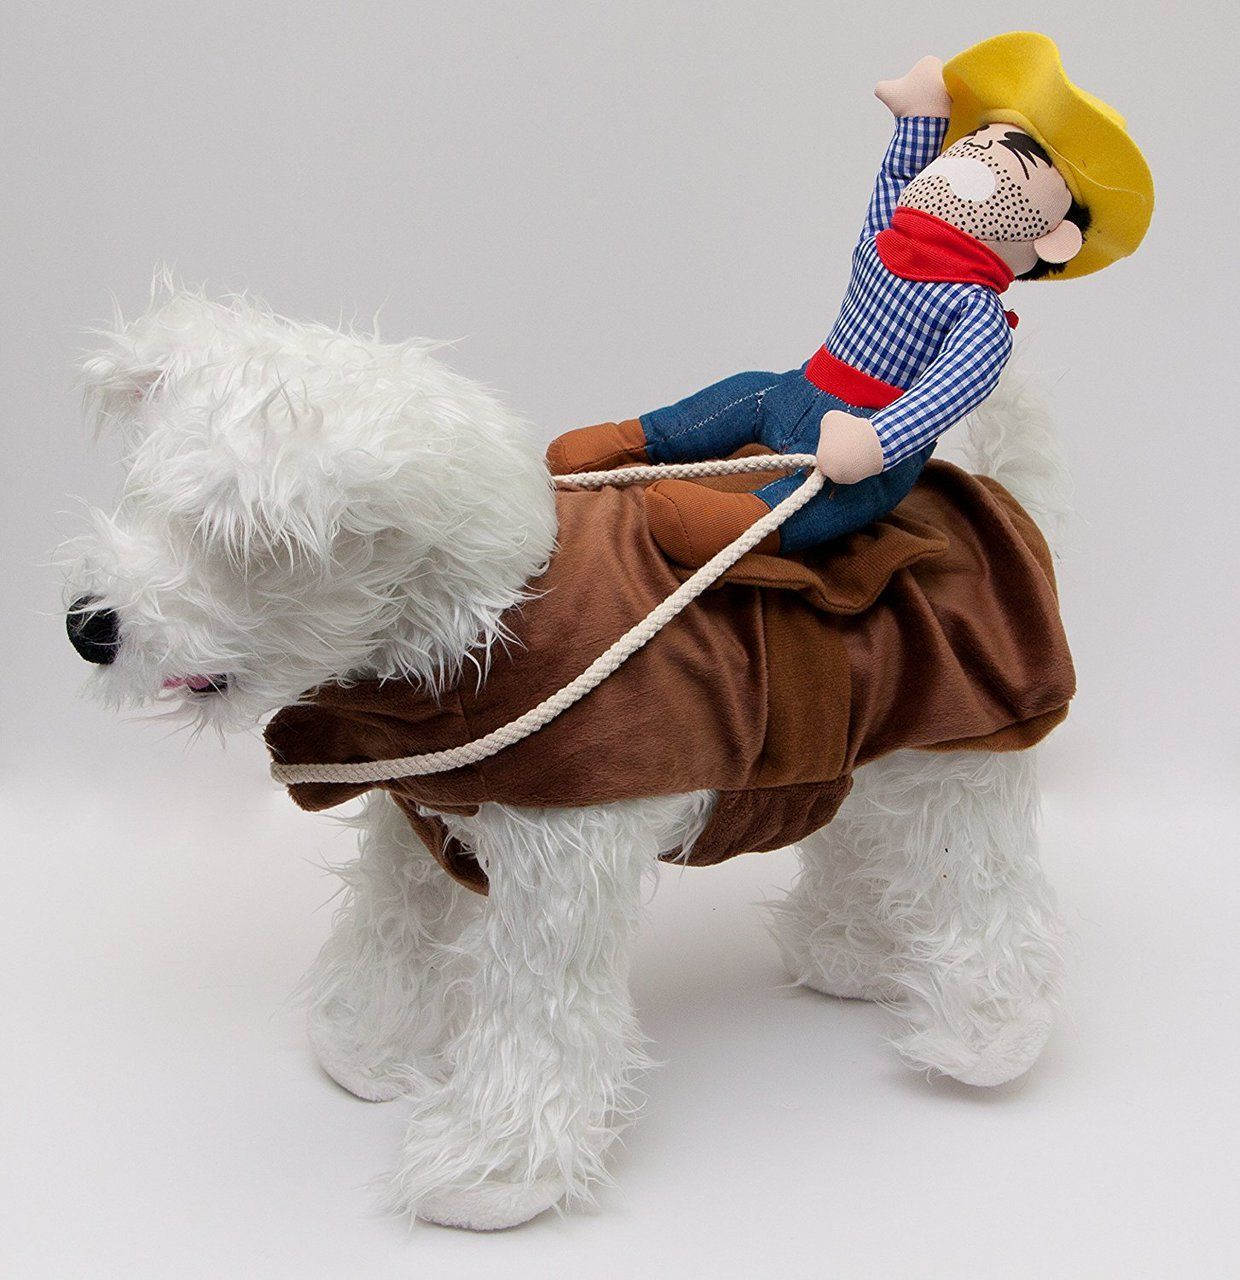 Bucking Bronco Cowboy Dog Costume By Midlee Cowboy Dog Costume